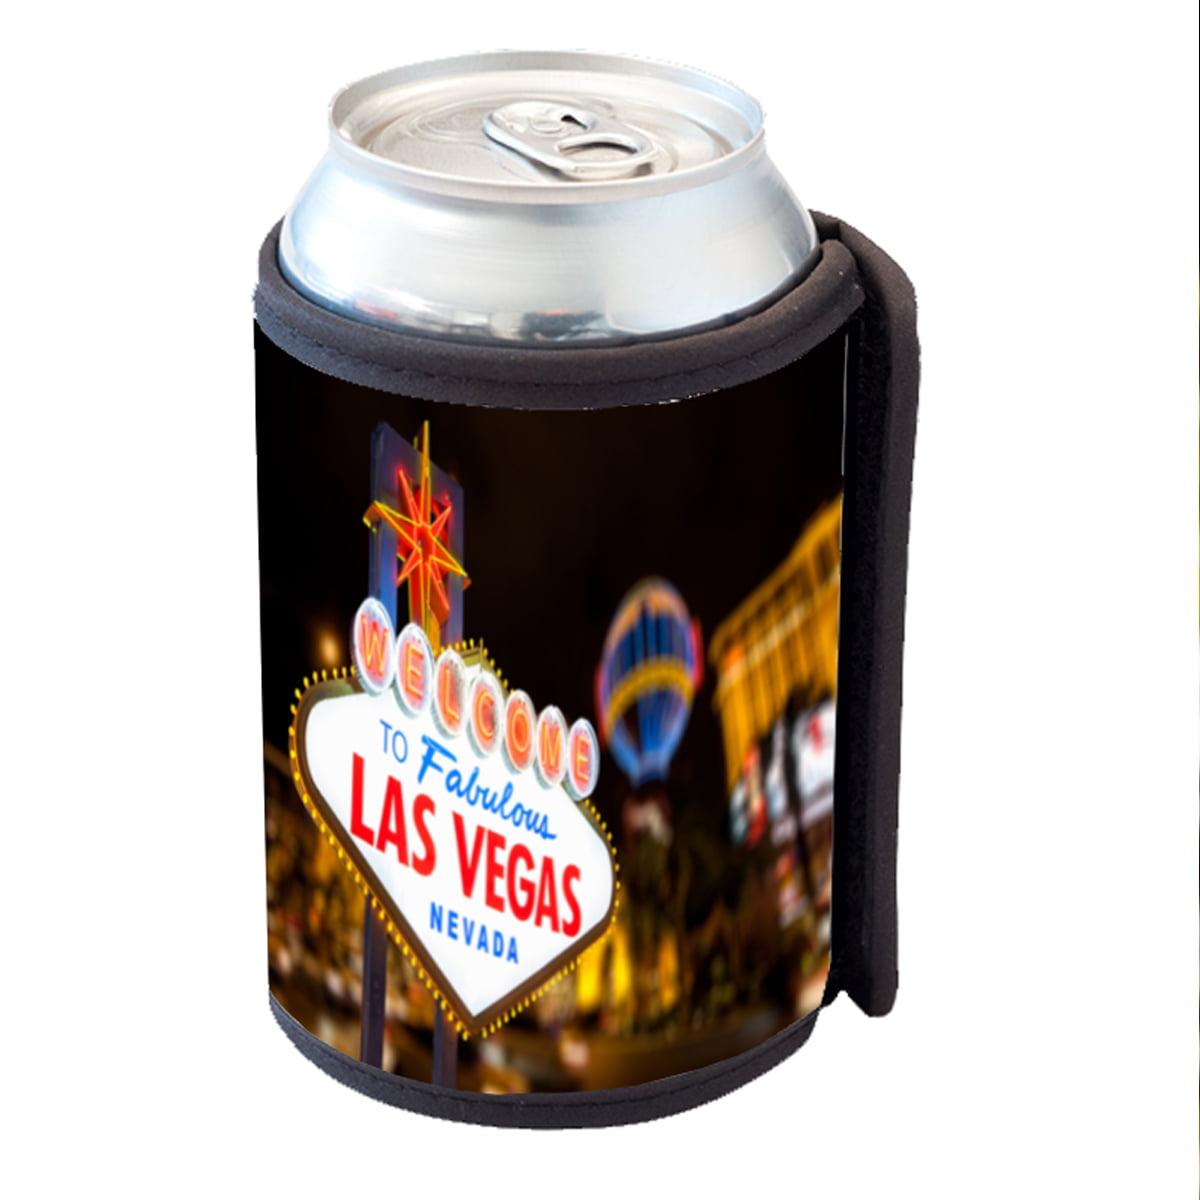 KuzmarK Insulated Drink Can Cooler Hugger - Fabulous Las Vegas